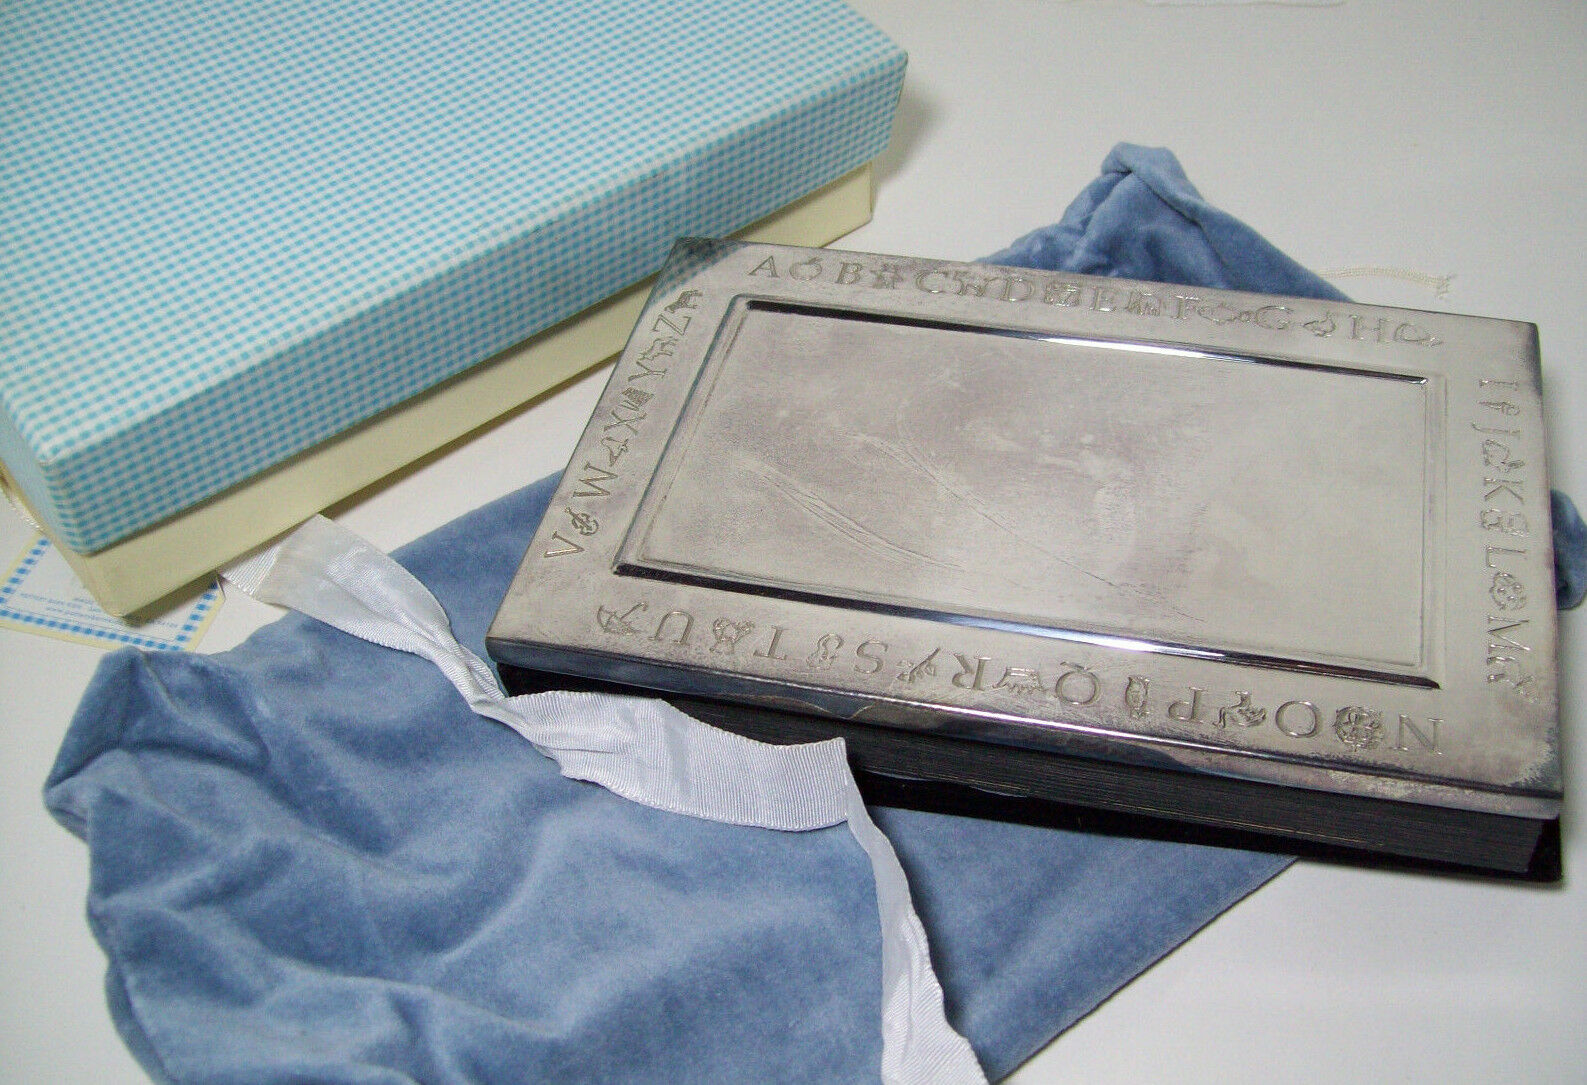 Emerald ash borer - Wikipedia Cheap wedding photography vancouver